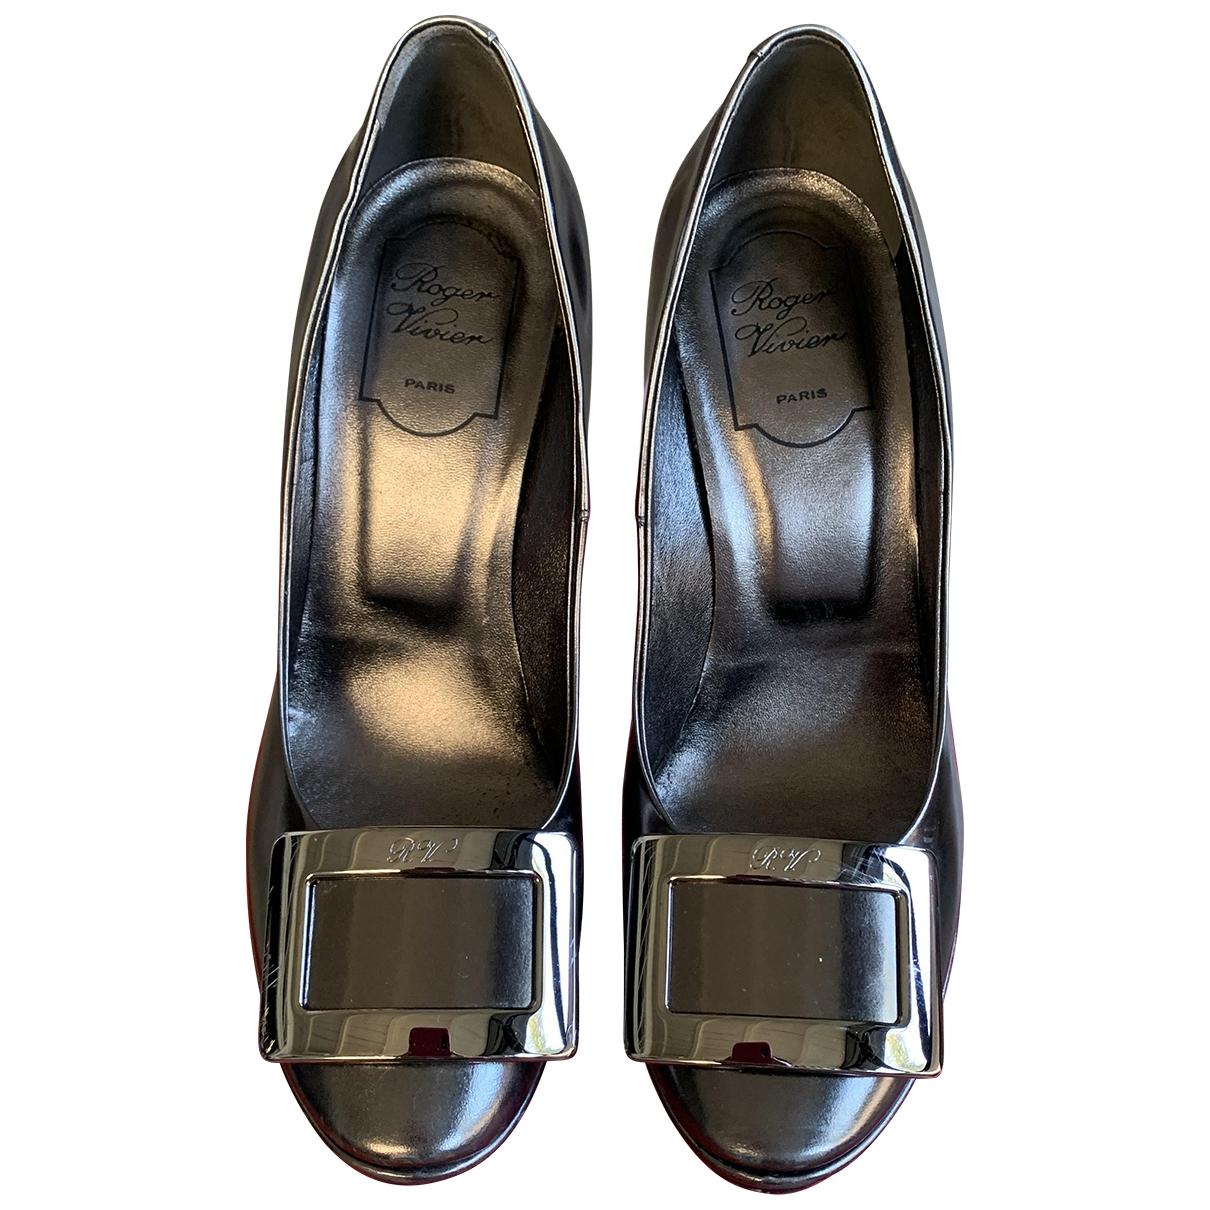 Roger Vivier \N Grey Patent leather Heels for Women 38 EU